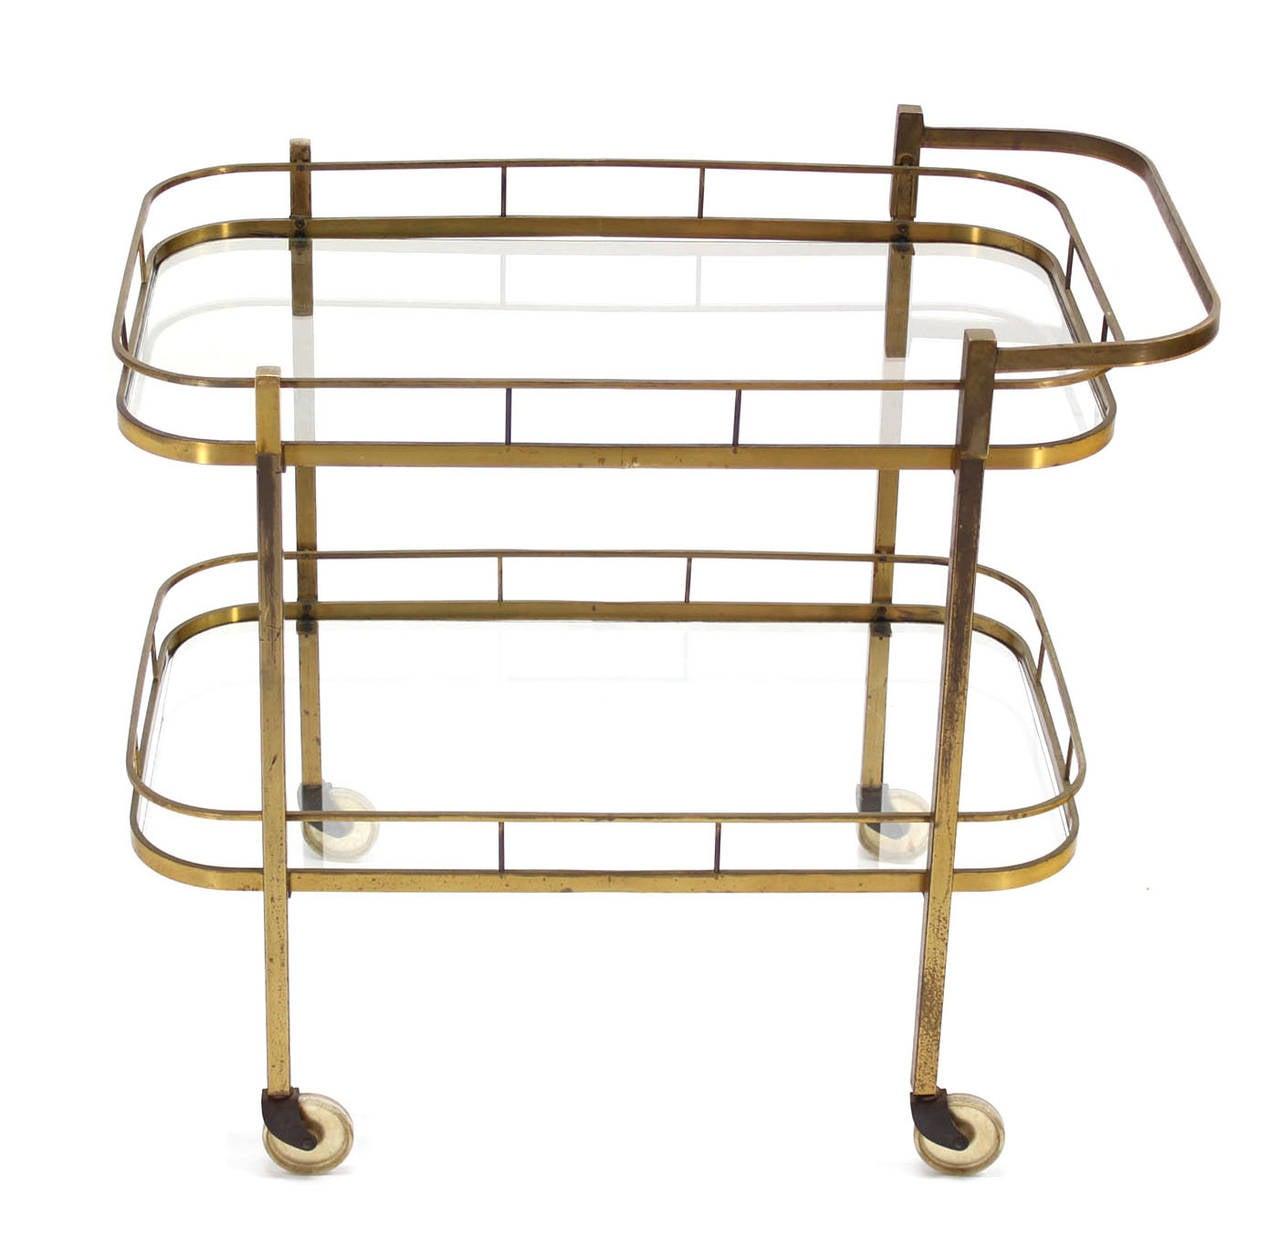 American Brass Tea or Bar Cart For Sale